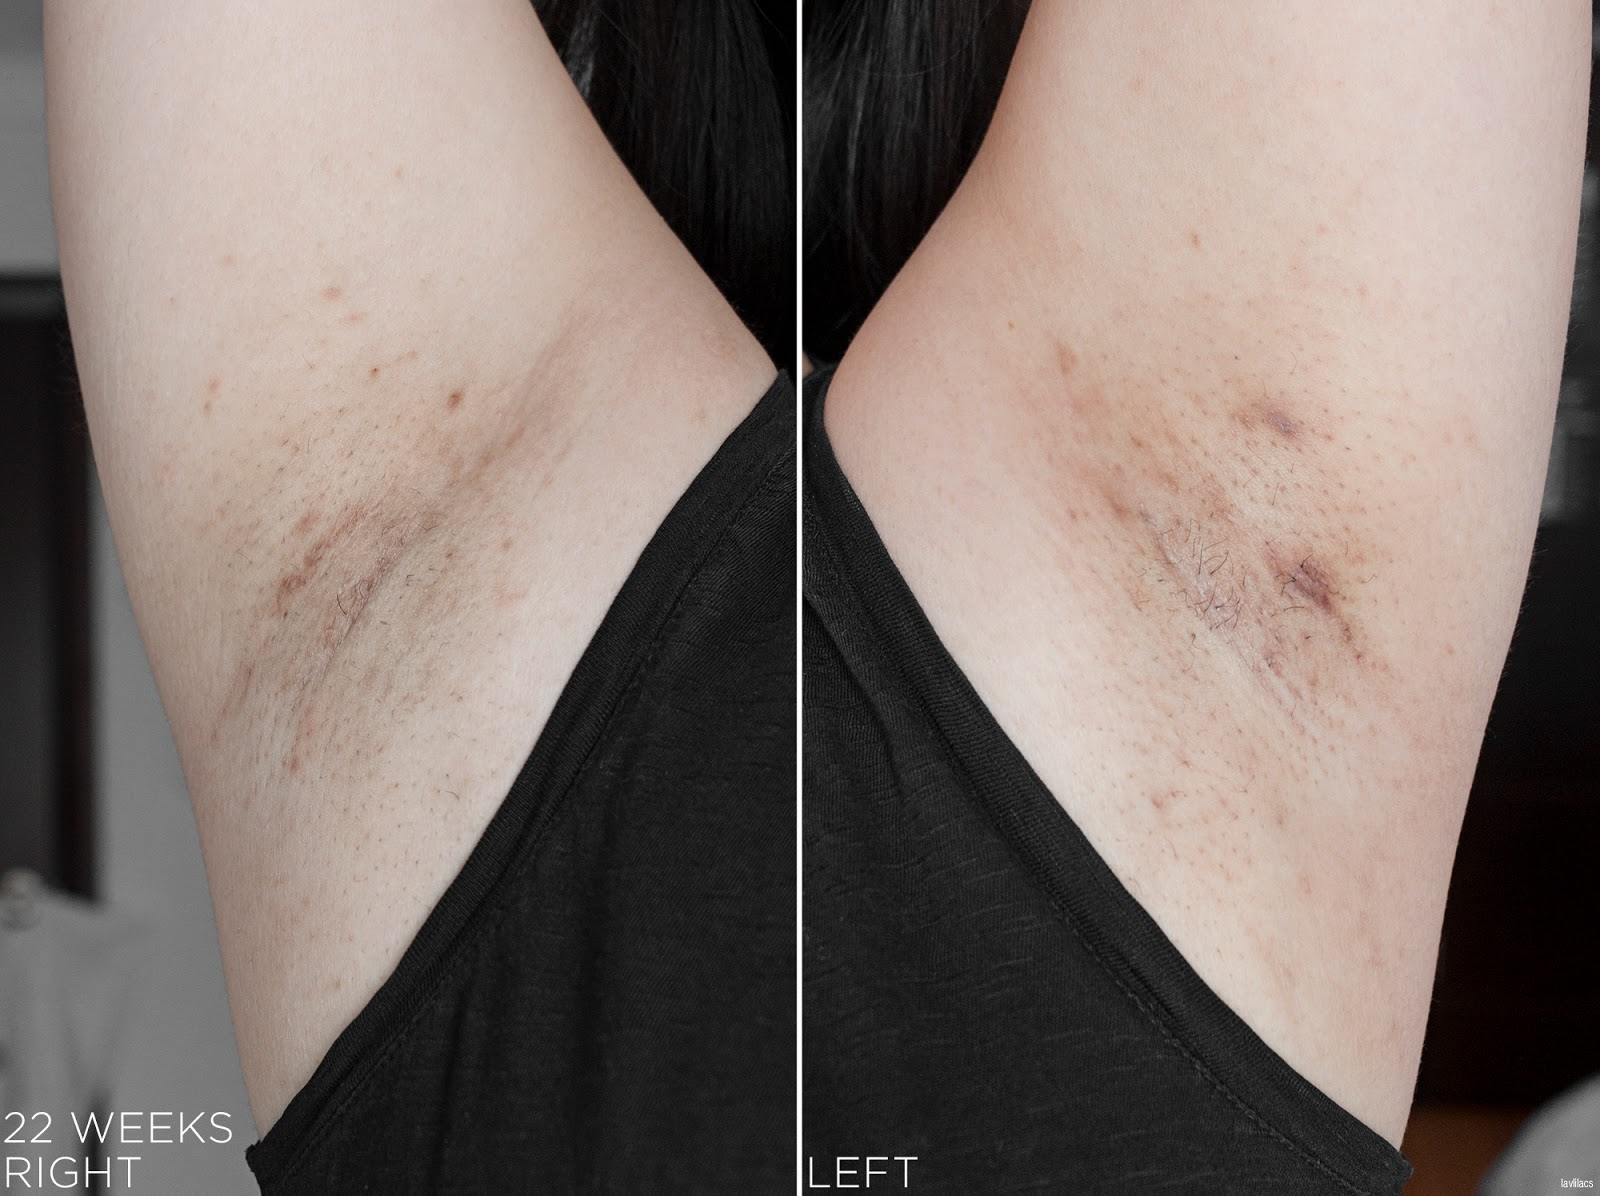 tria Hair Removal Laser Armpits Hair 22 Weeks, 5 months